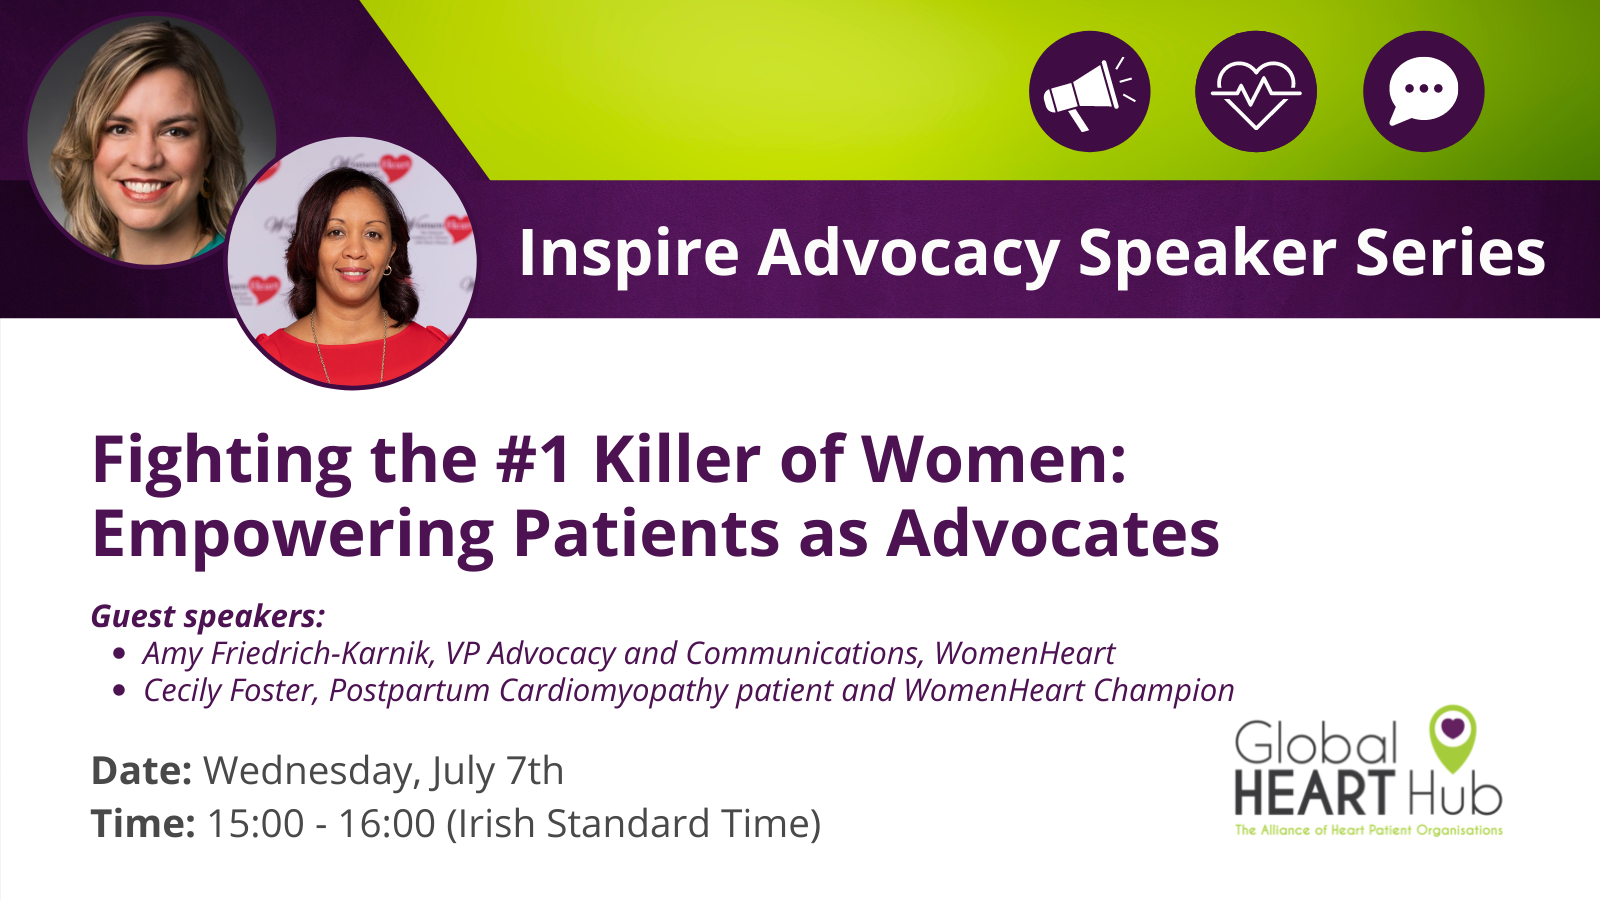 Invitation to the Global Heart Hub advocacy speaker series.